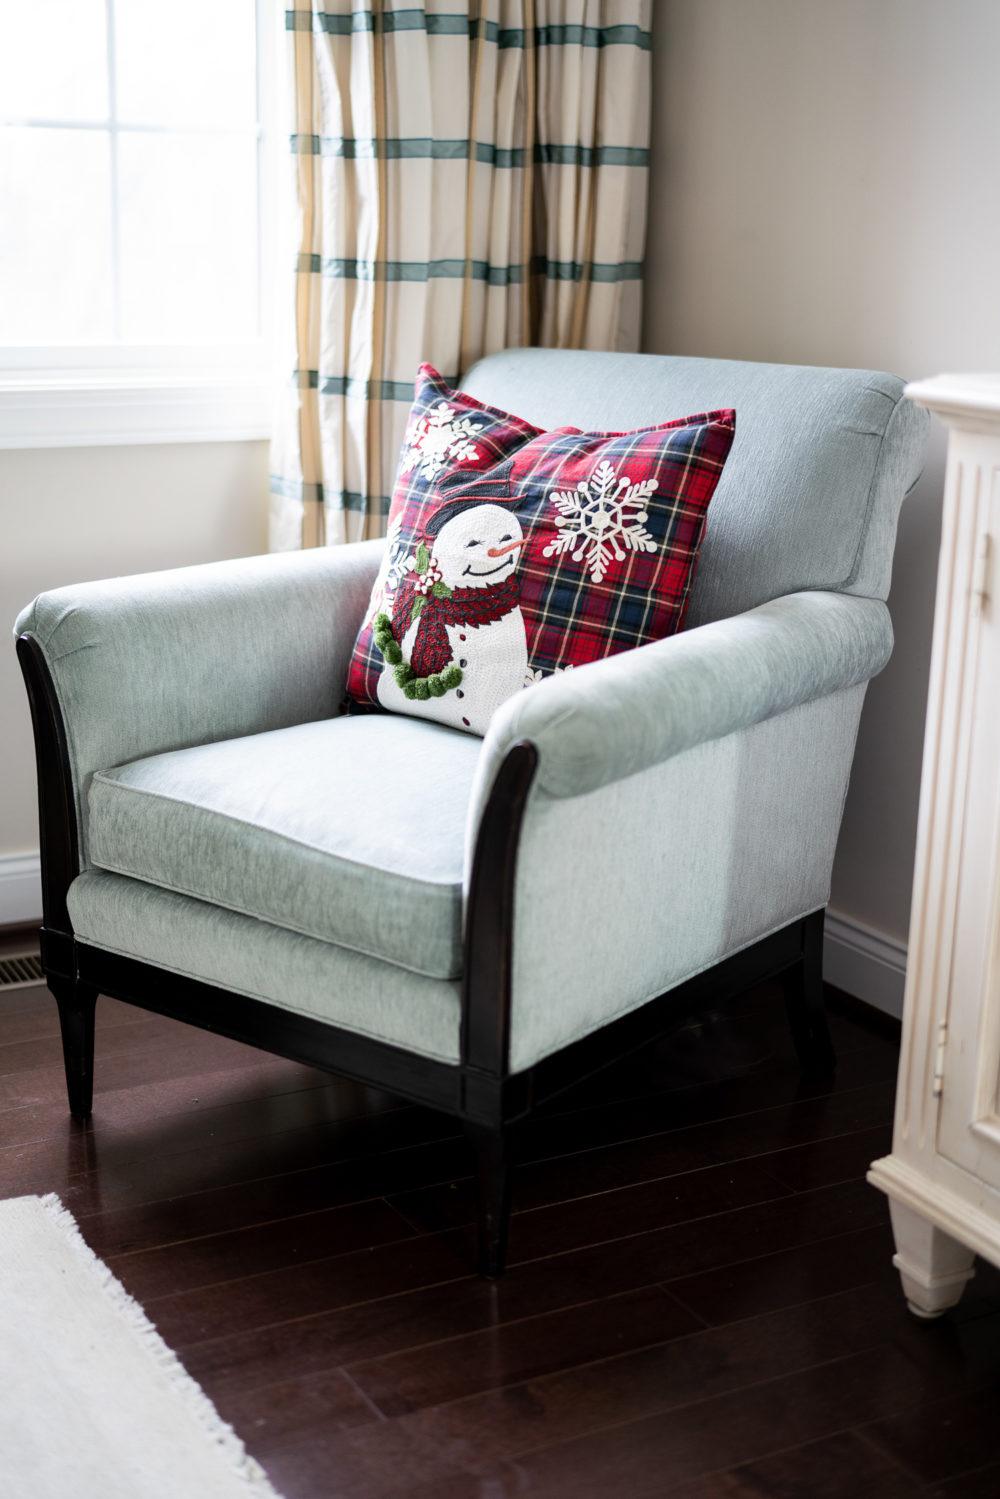 Petite Fashion Blog | Our Home for the Holidays | Christmas Decor | Flocked Christmas Tree | Christmas Pillows | Pottery Barn Pillows